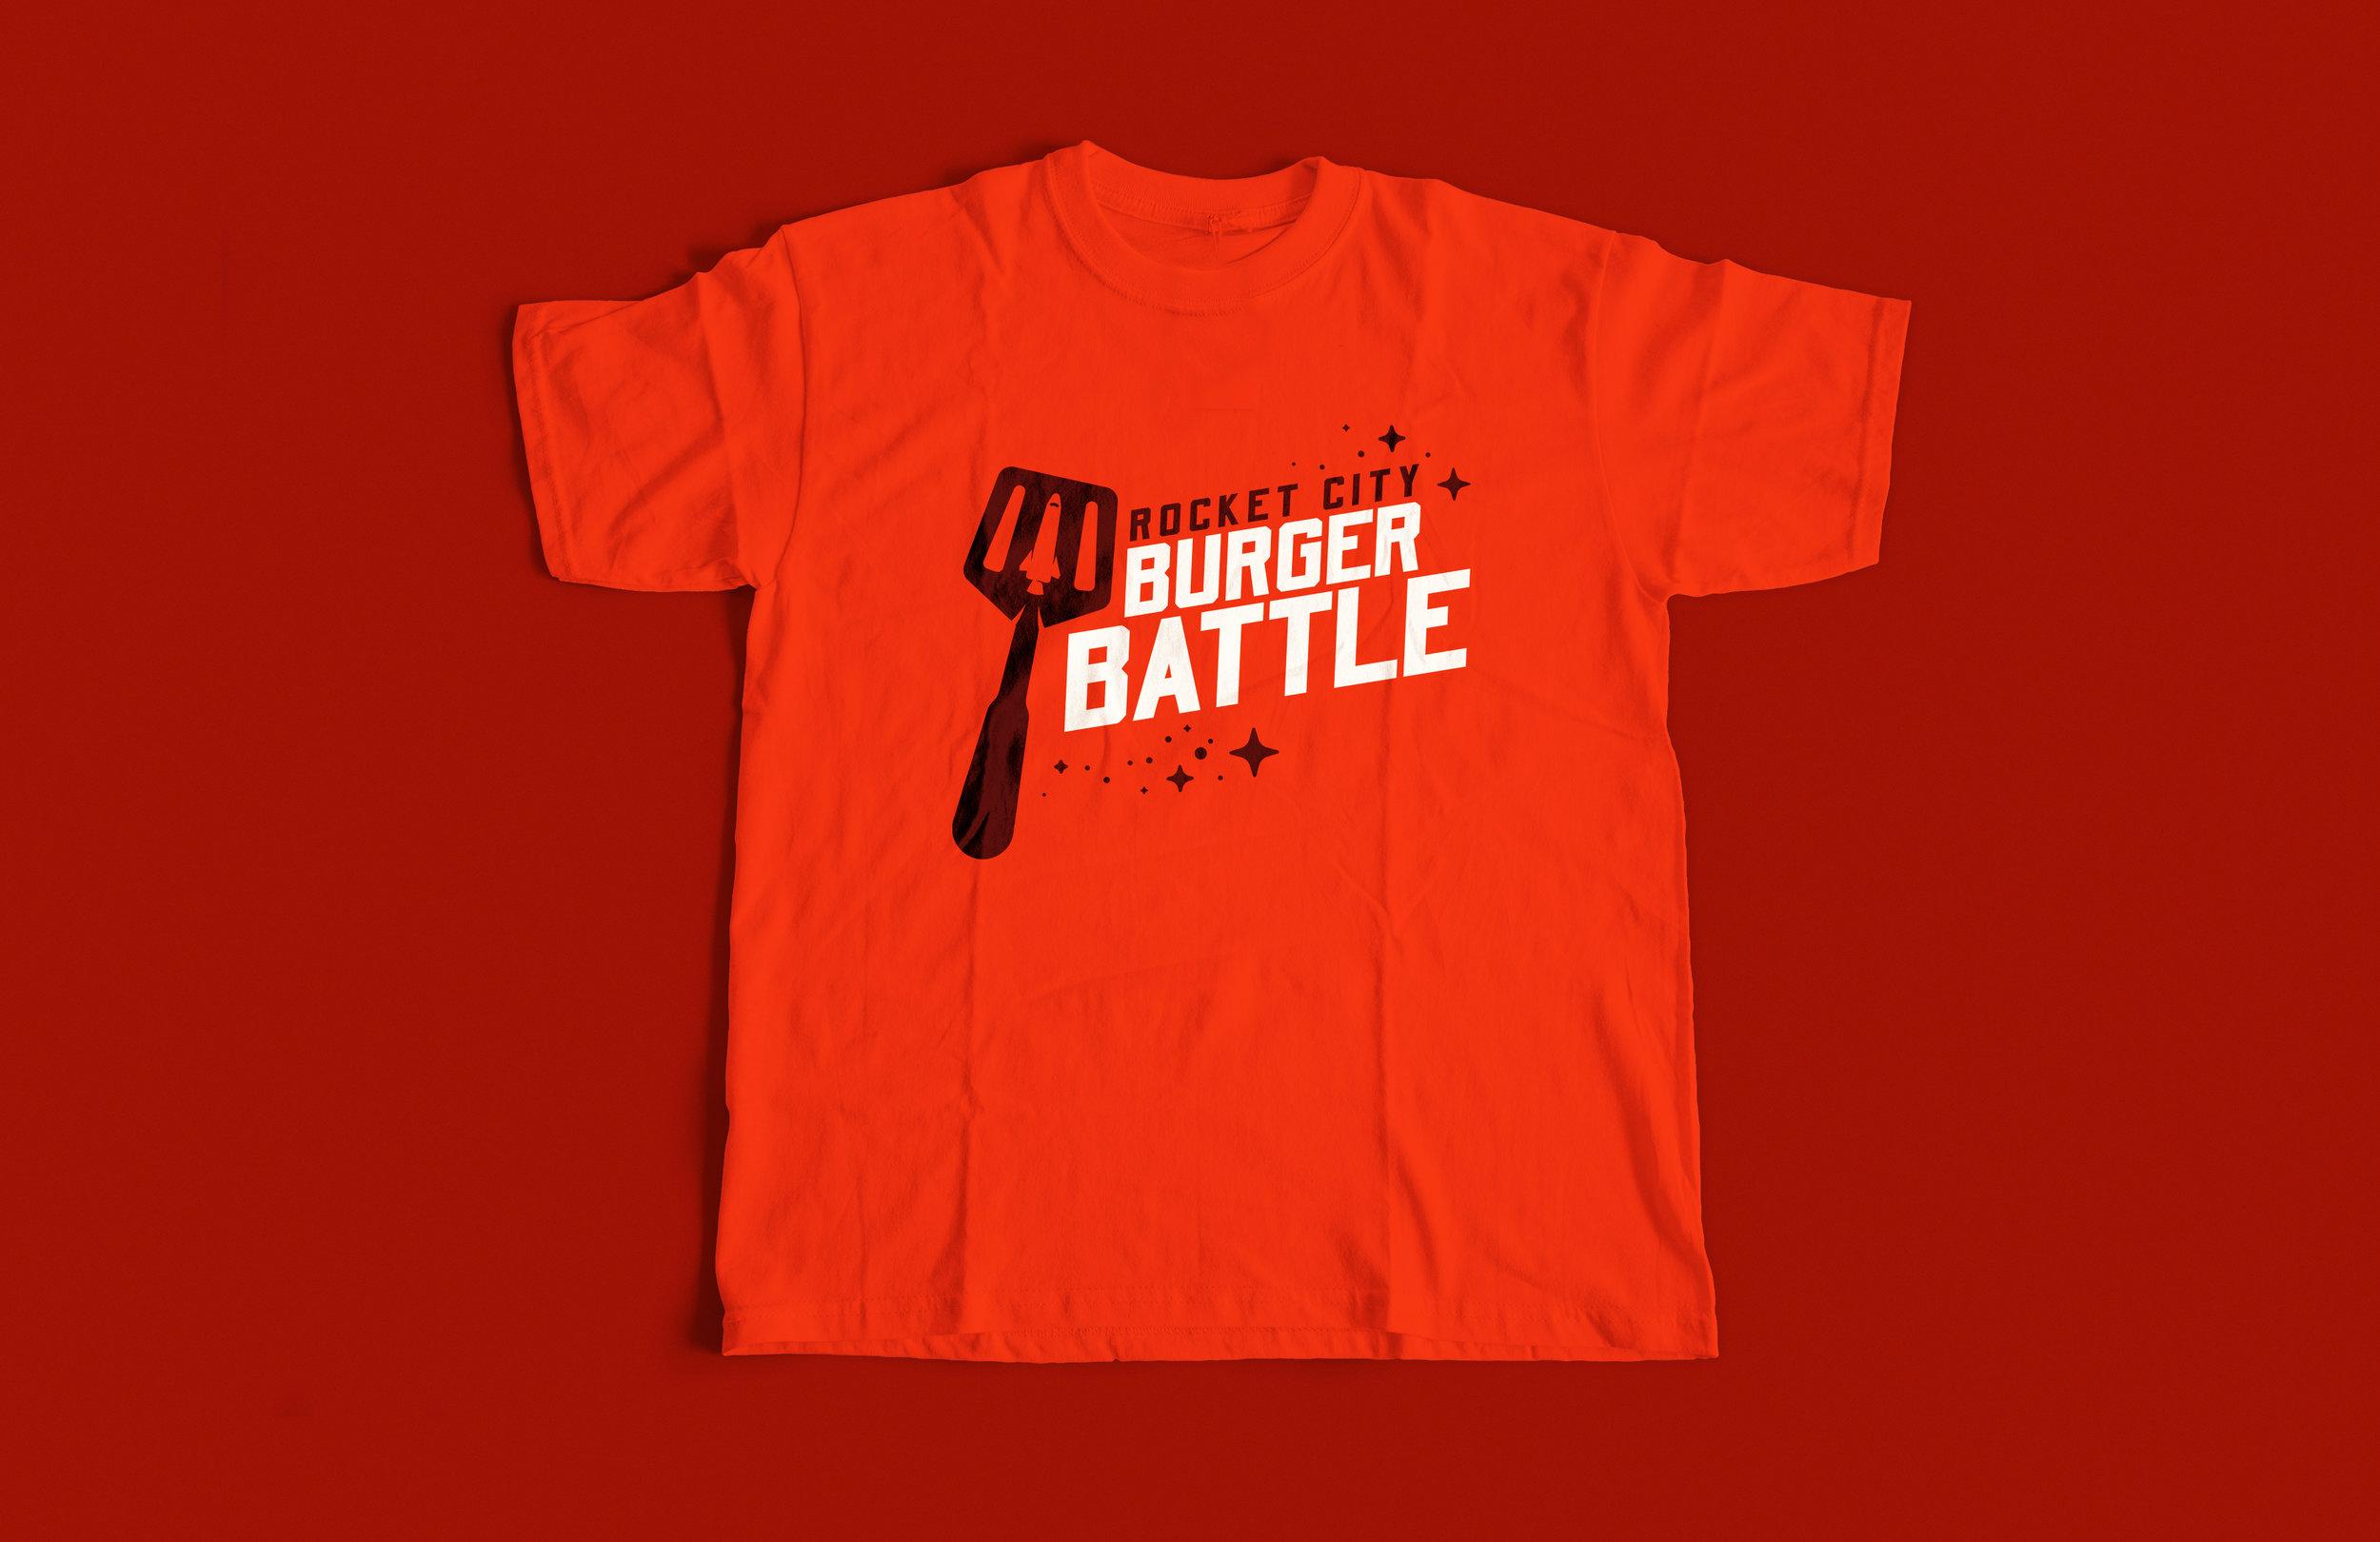 Campus805_BurgerBattle_Logo_shirt-mockup-3 copy.jpg